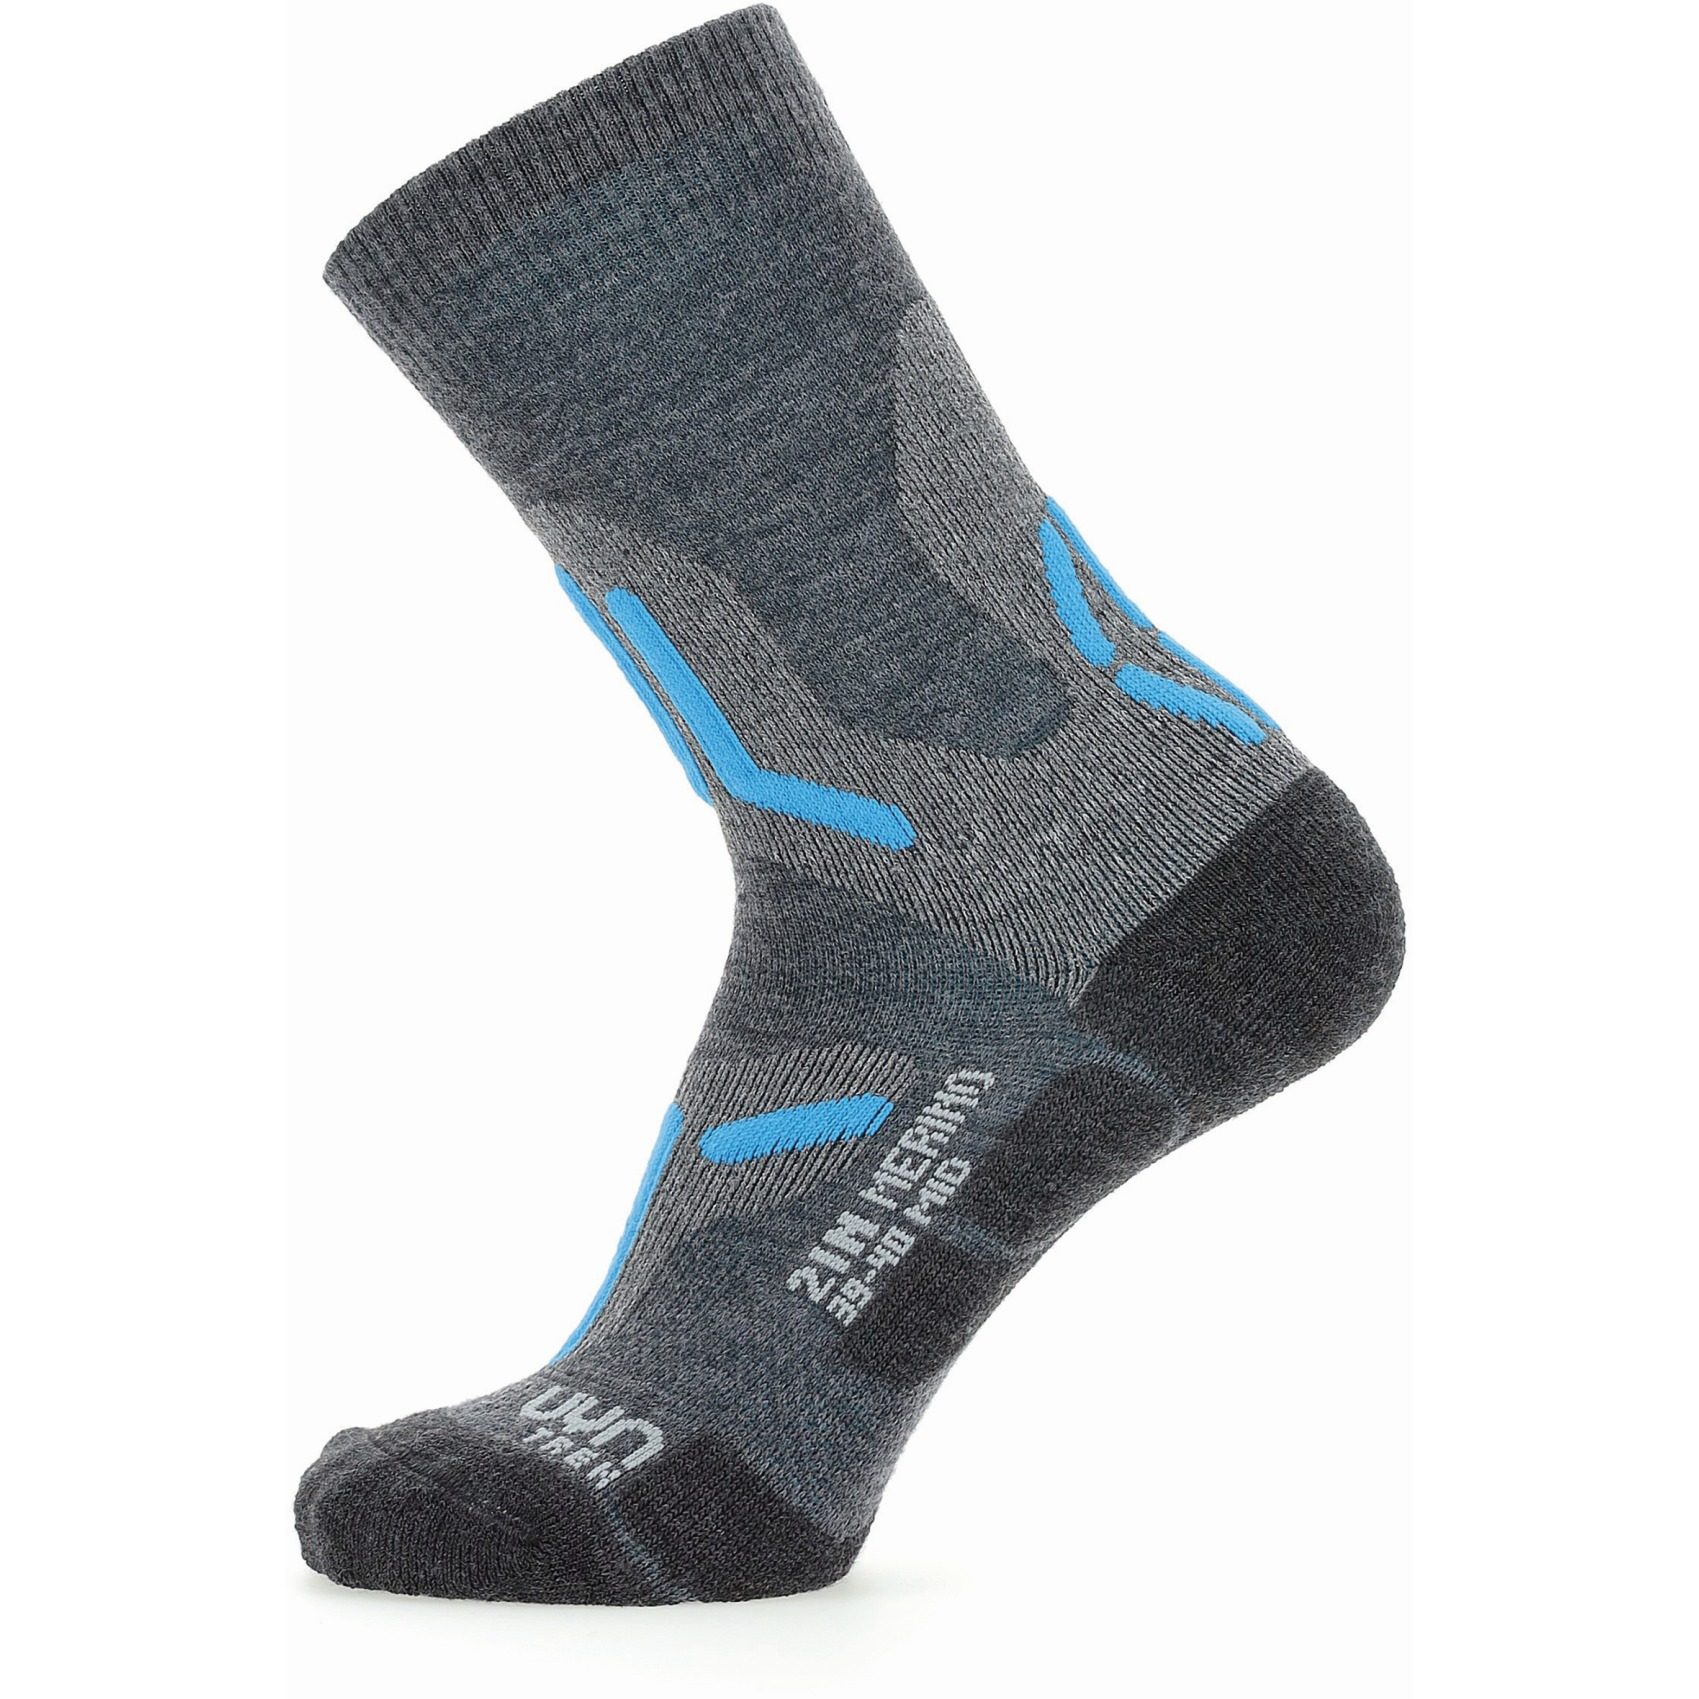 Image of UYN Trekking 2In Merino Mid Cut Socks Women - Mid Grey/Turquoise